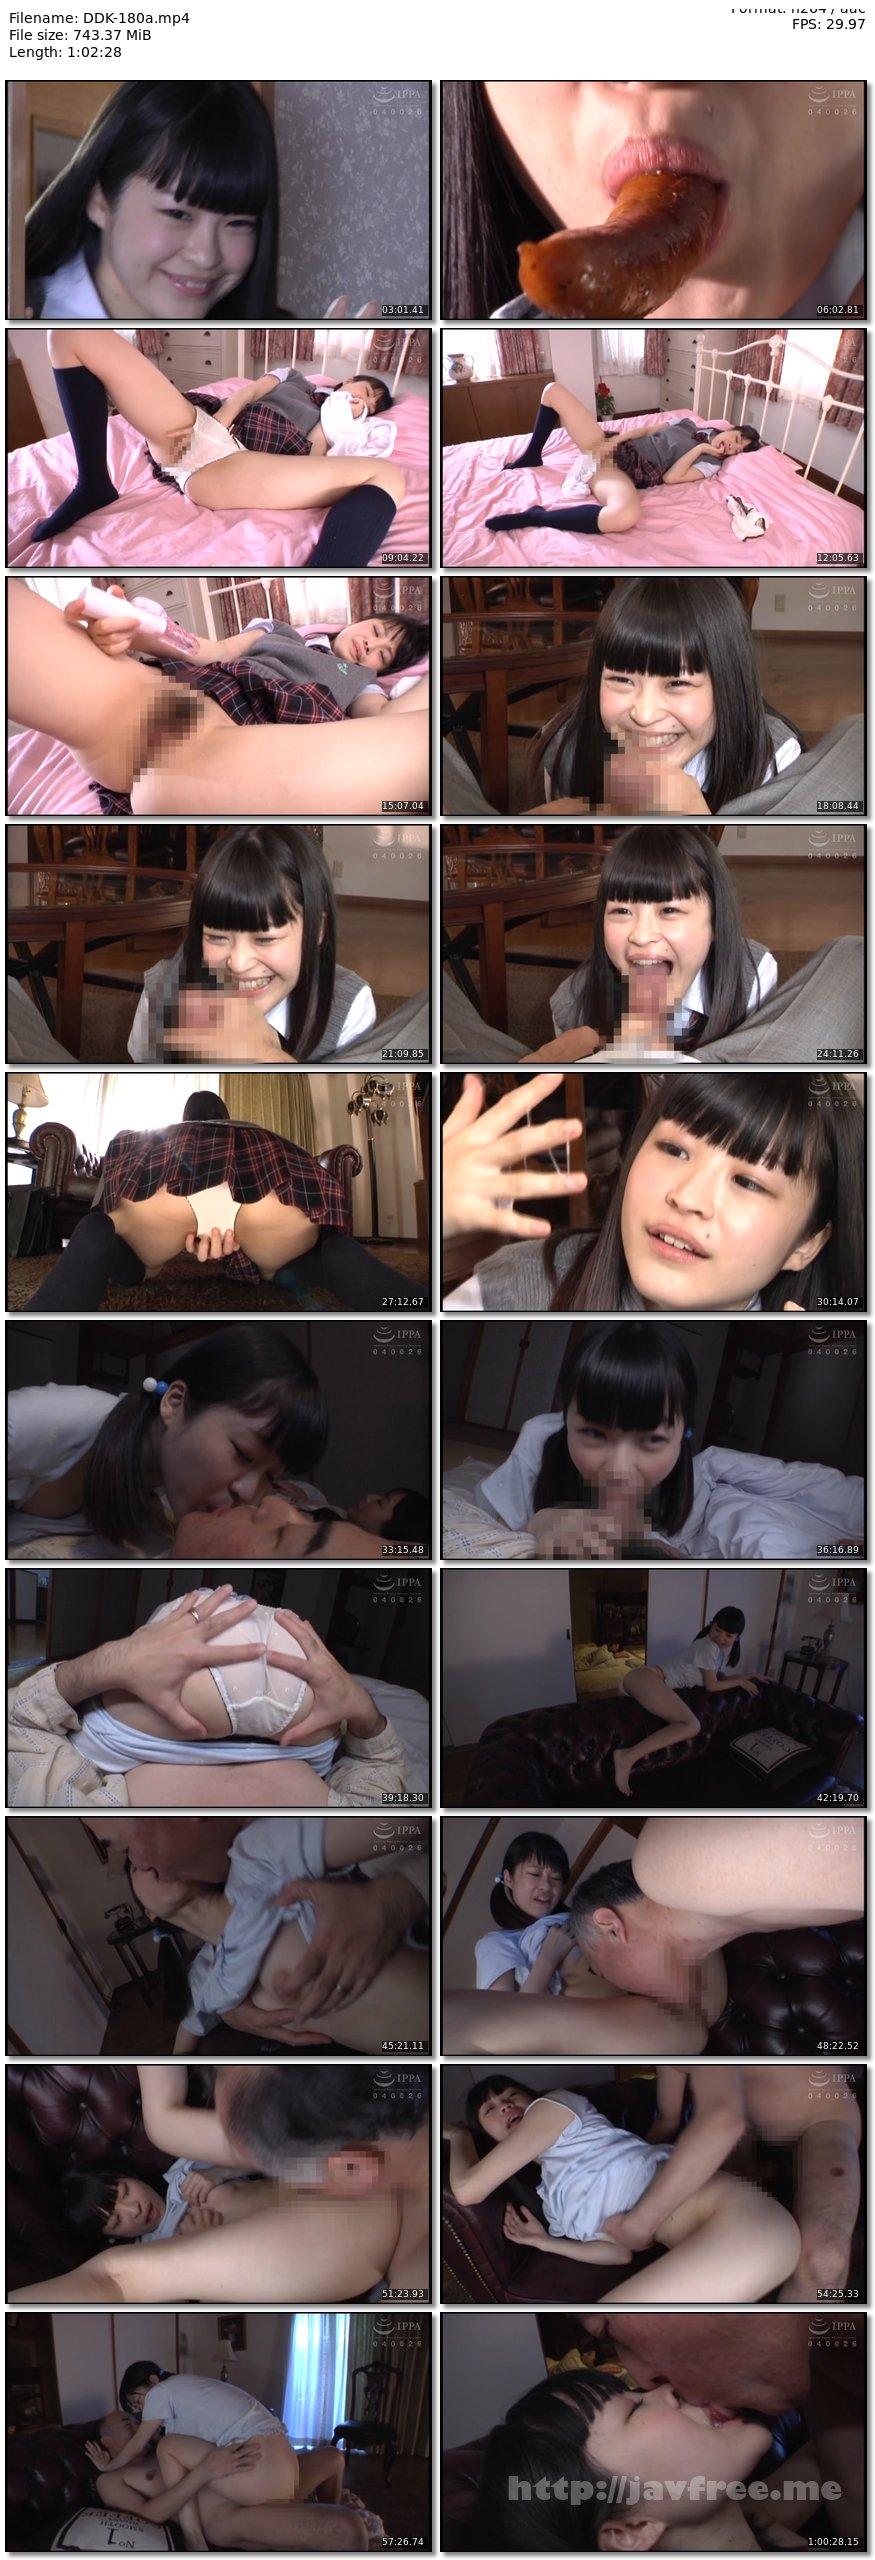 [DDK-180] 小悪魔な姪っ子たちが発情期で困っています! - image DDK-180a on https://javfree.me